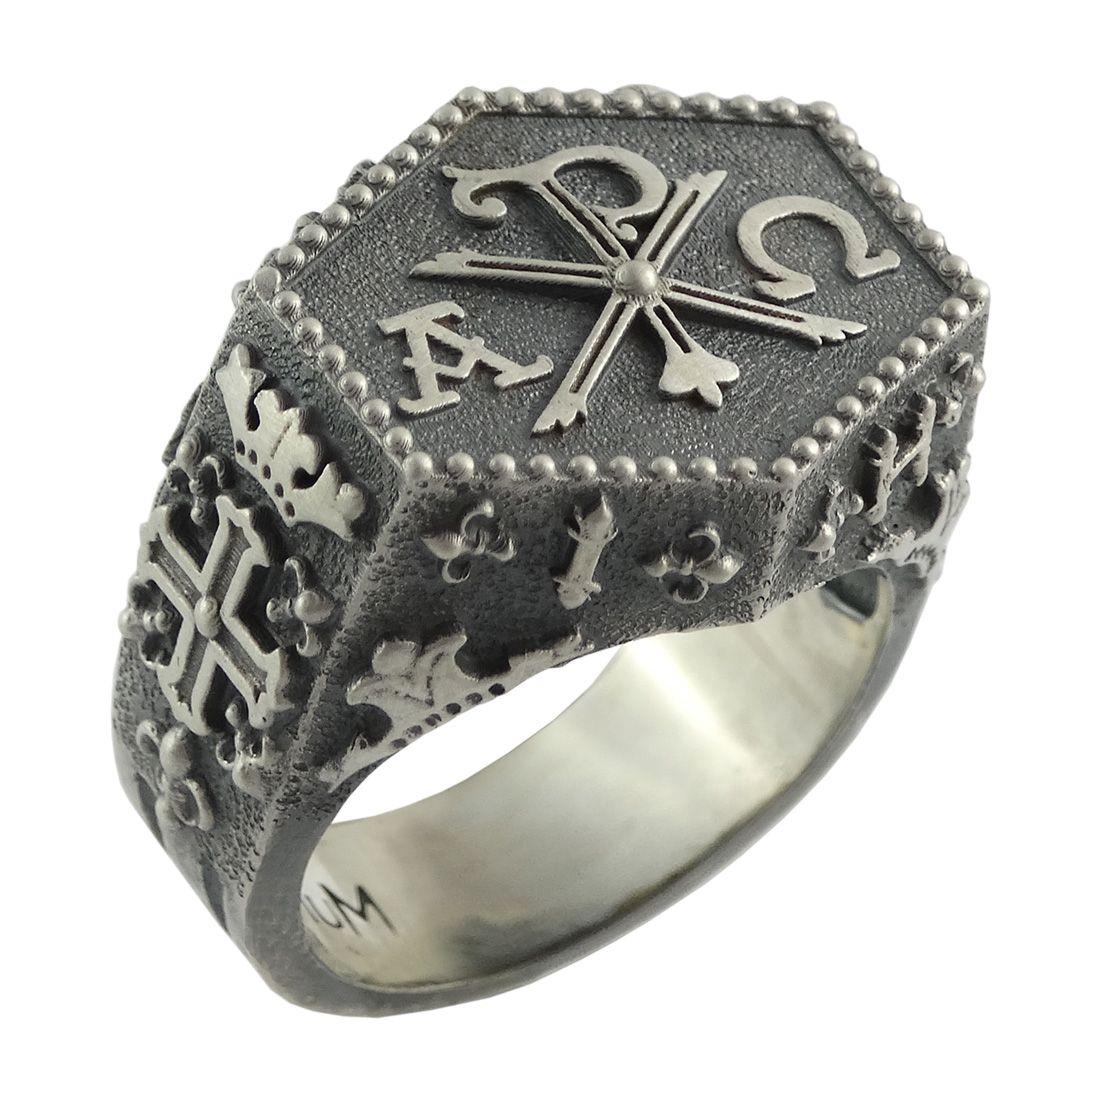 253ccc631d8 Knights Templar Ihsv Masonic Chi Rho Silver Ring Cross Of Constantine Us  Sizes by Secretium Ltd